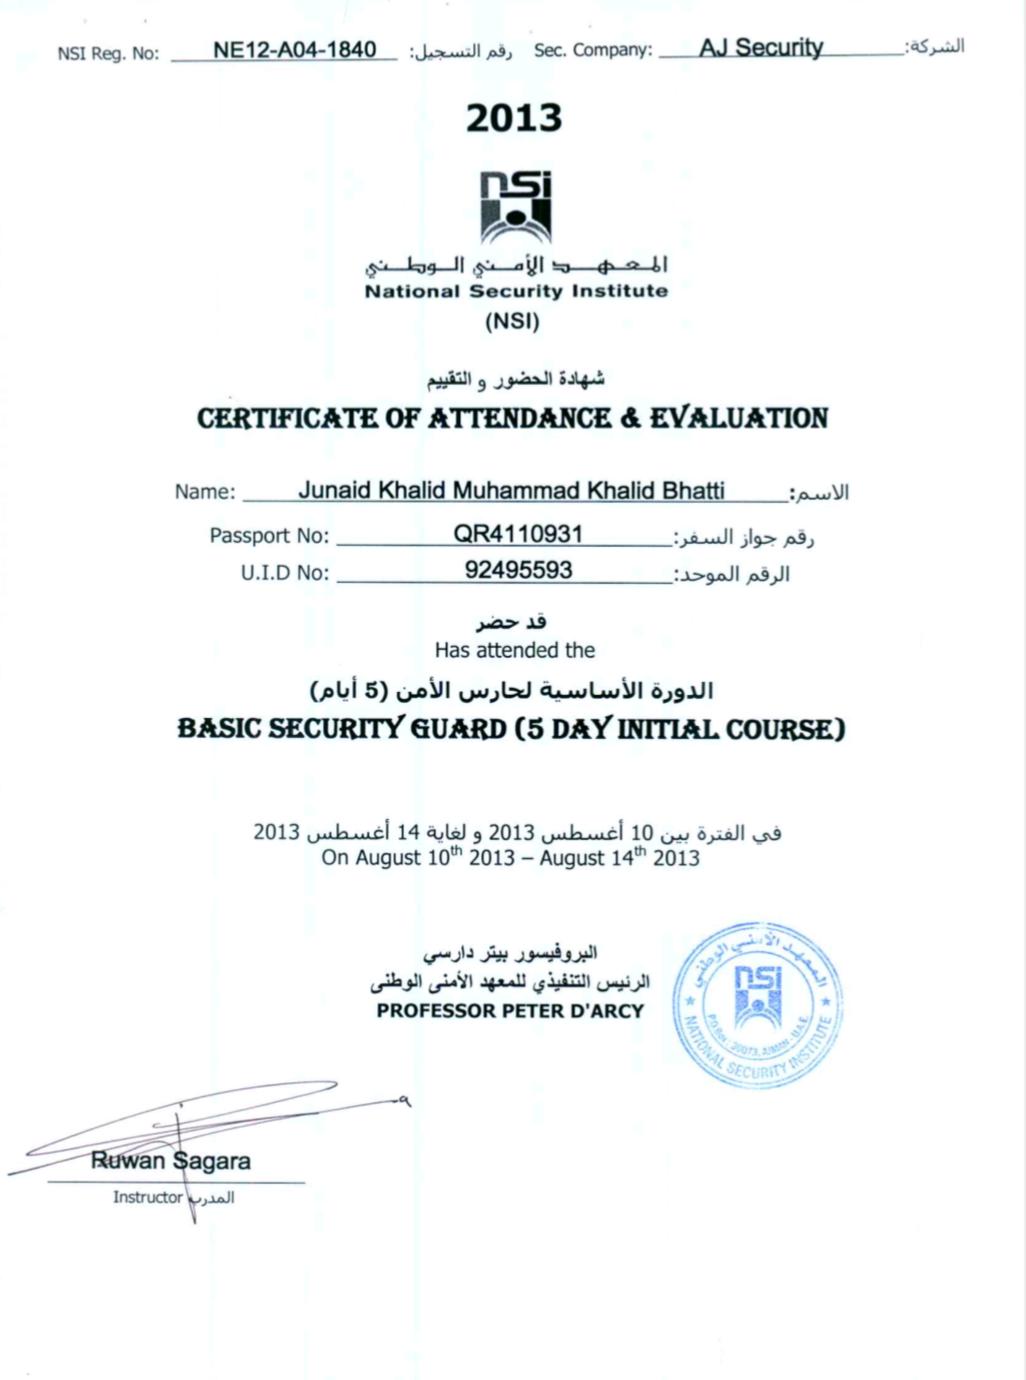 NSI Certificate-2013.png